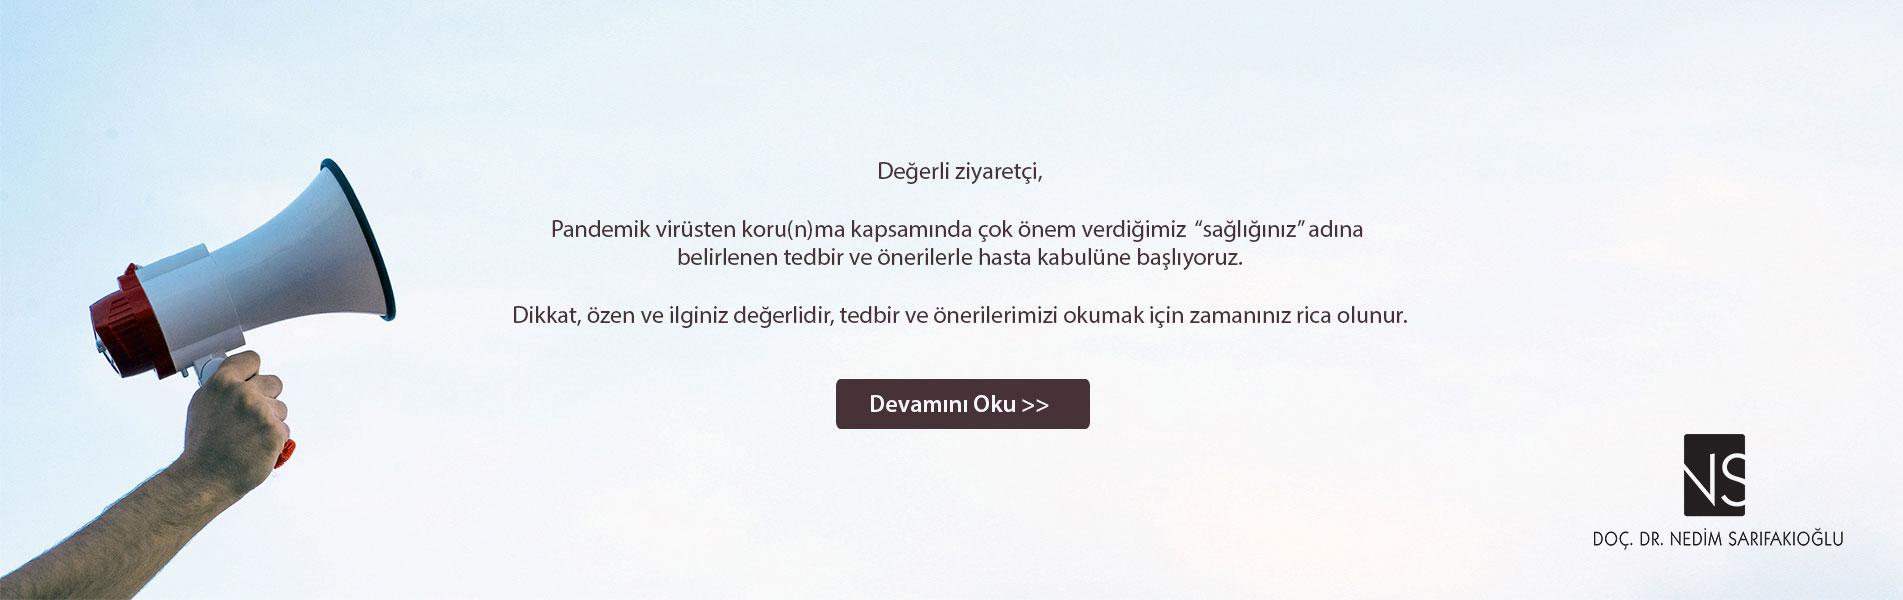 estetikcerrahi_pandemi_covid19_2